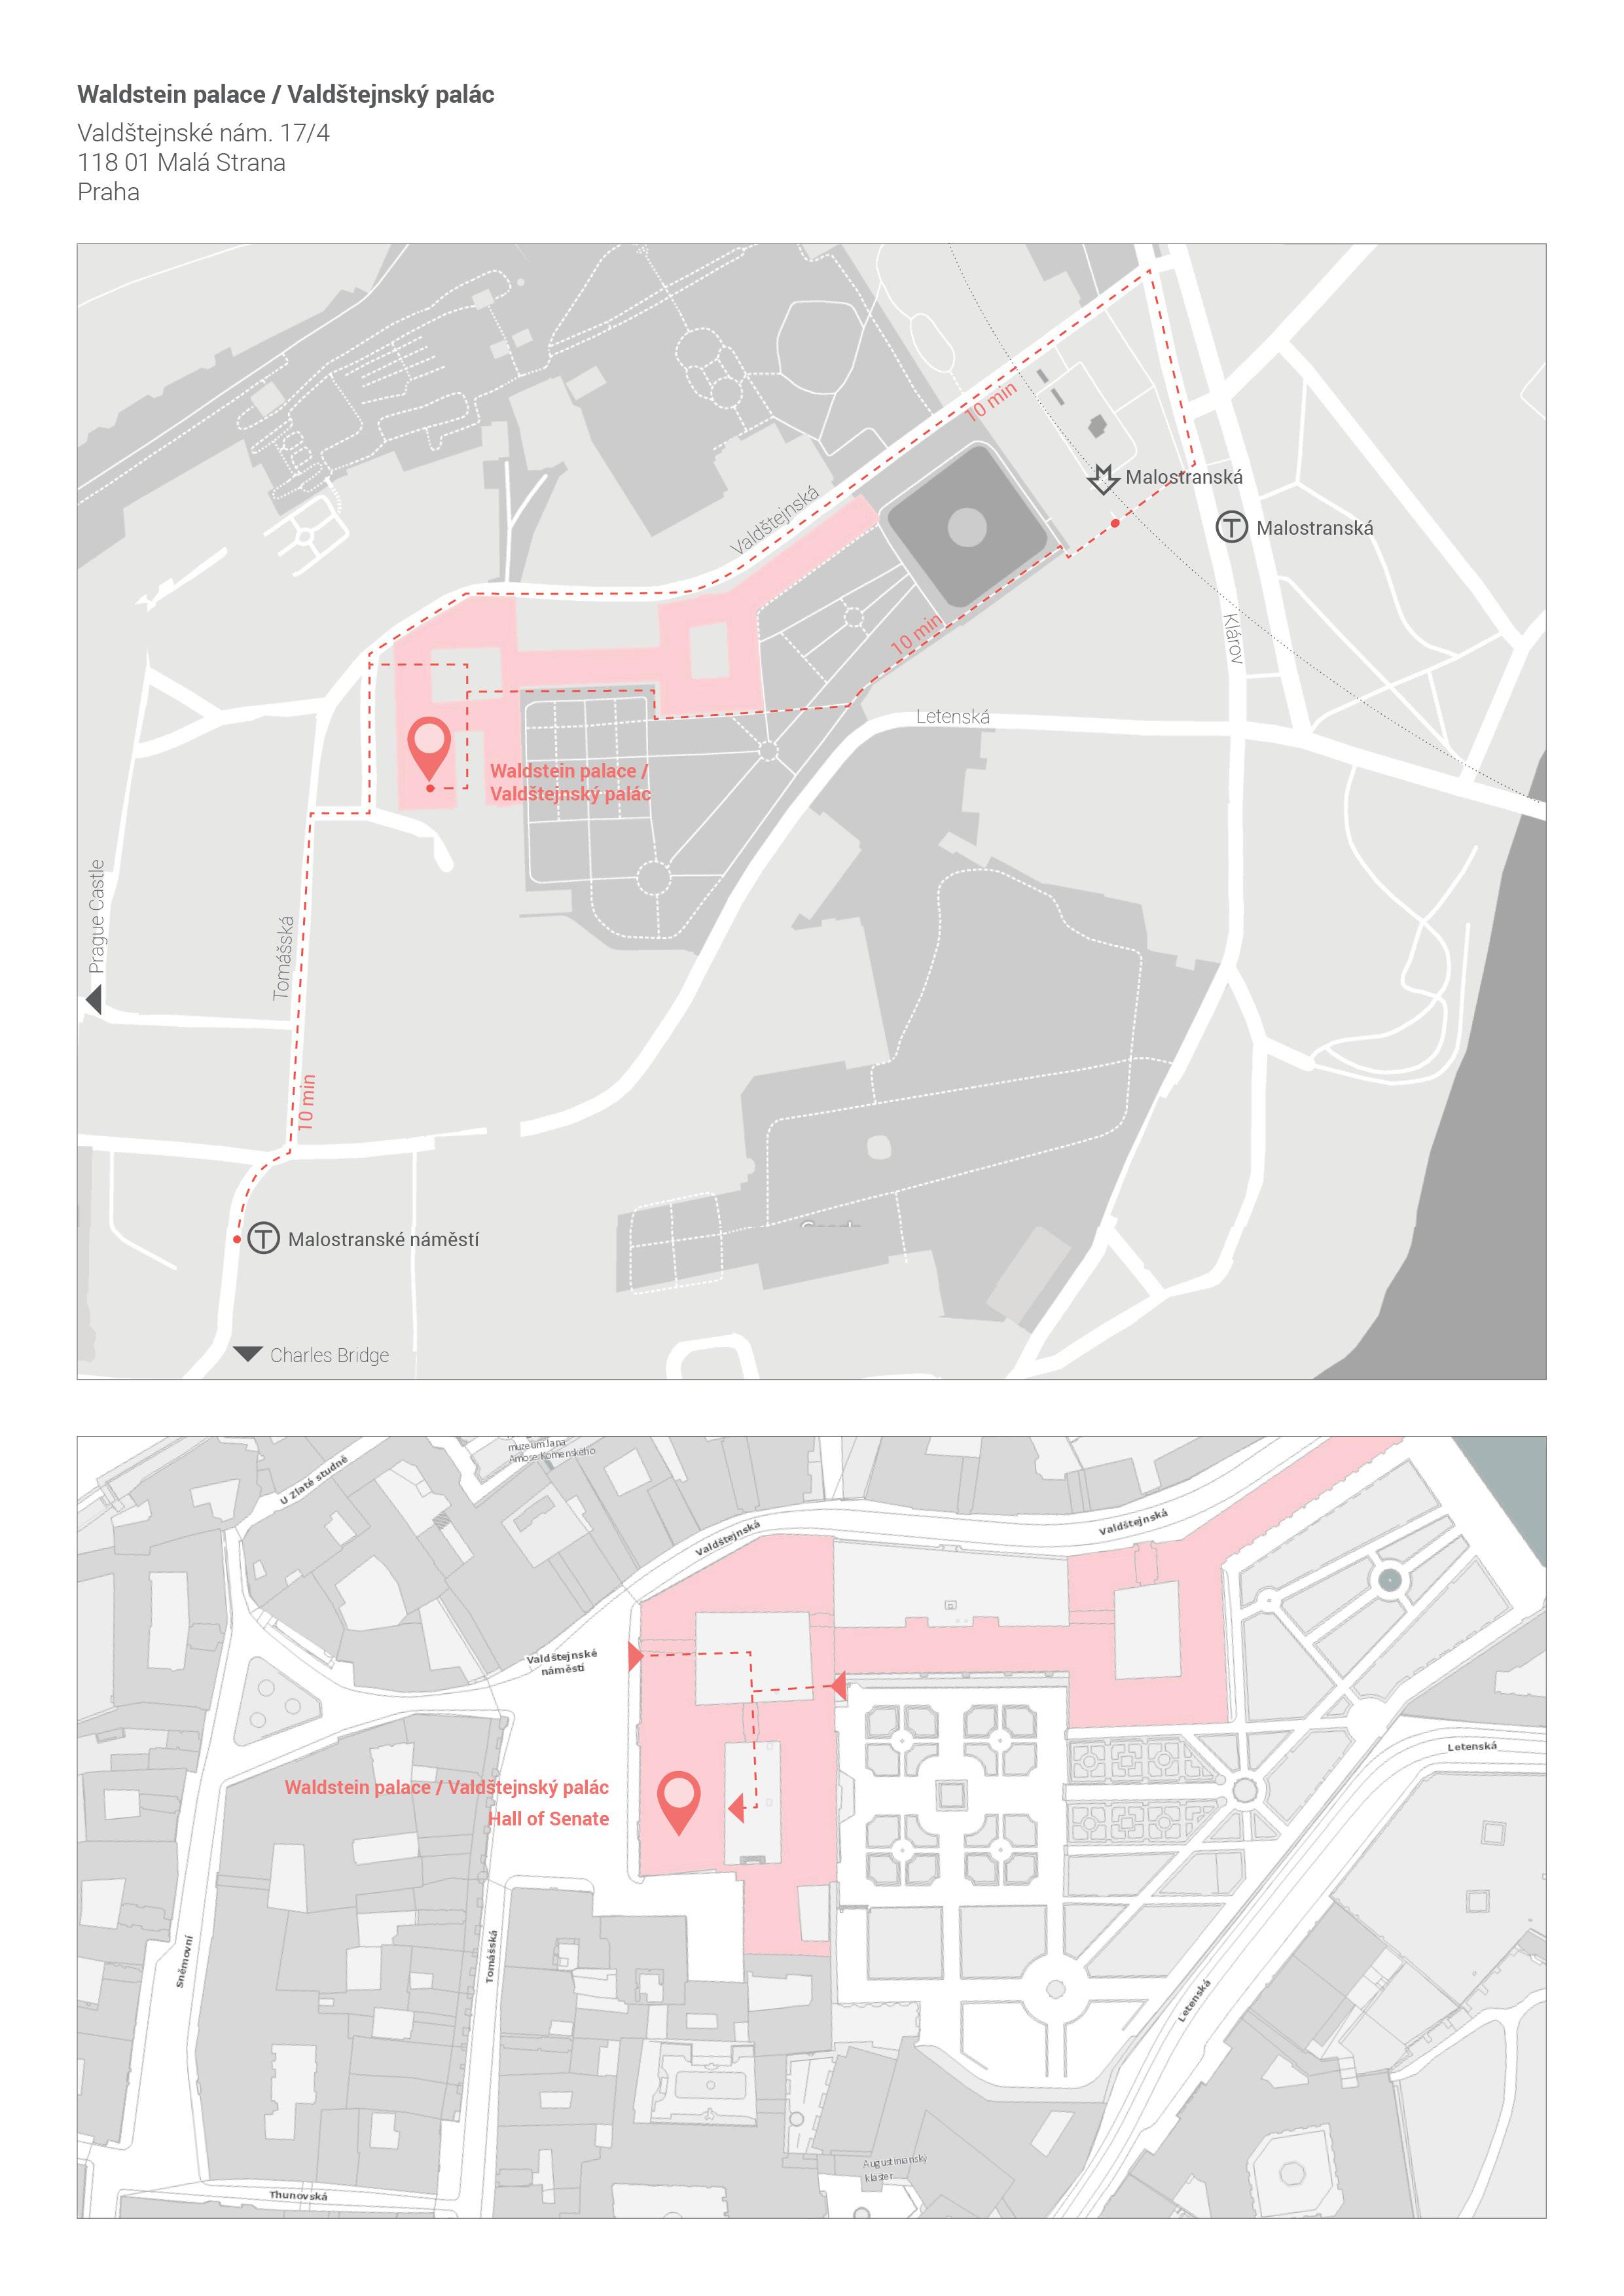 AIA_Prague_locations-17-09-29.jpg